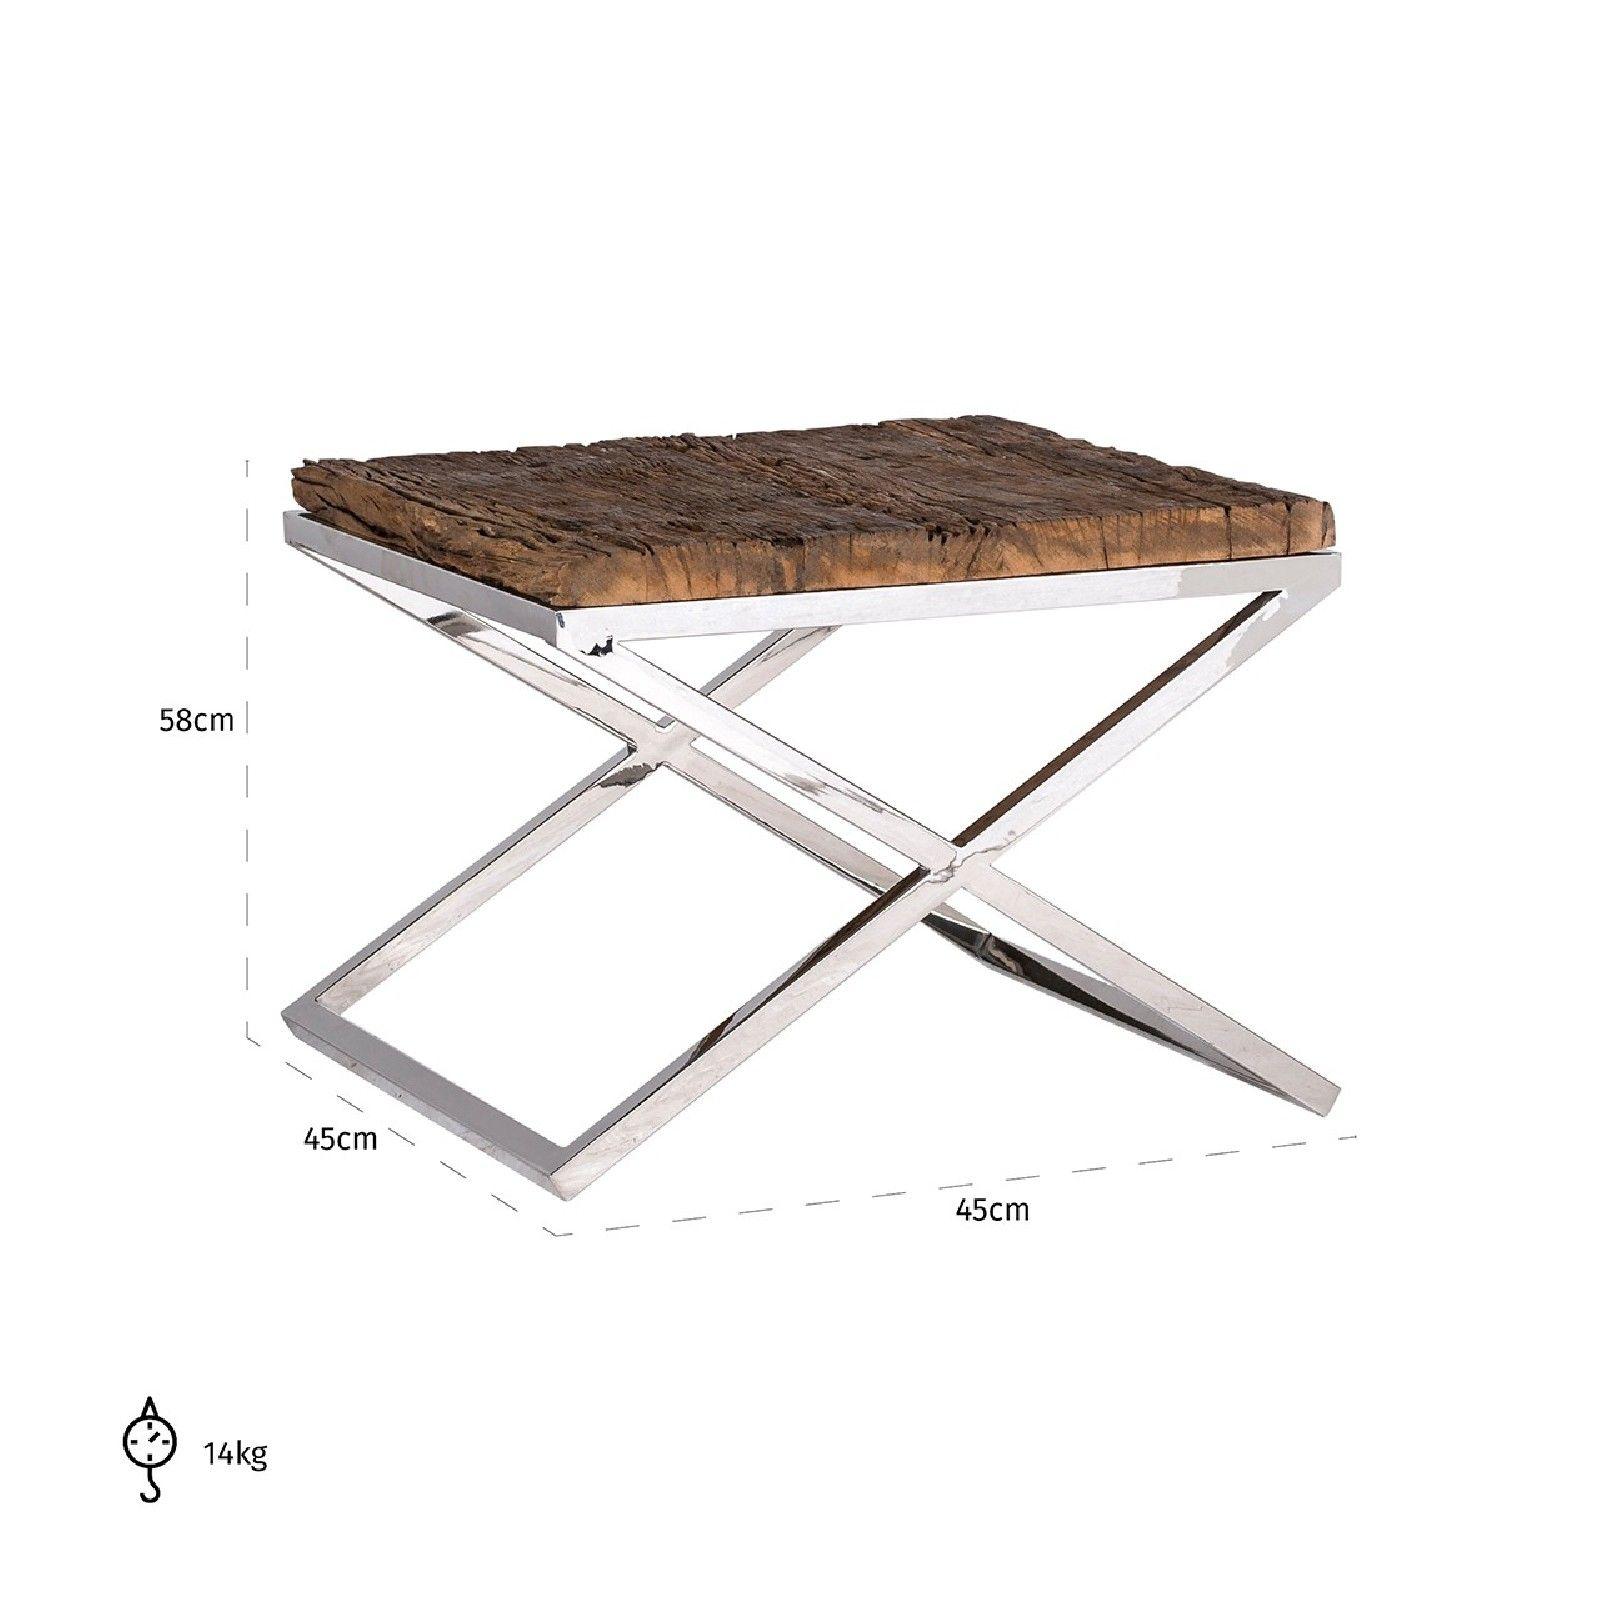 Table d'angle Kensington 60x60 Meuble Déco Tendance - 265